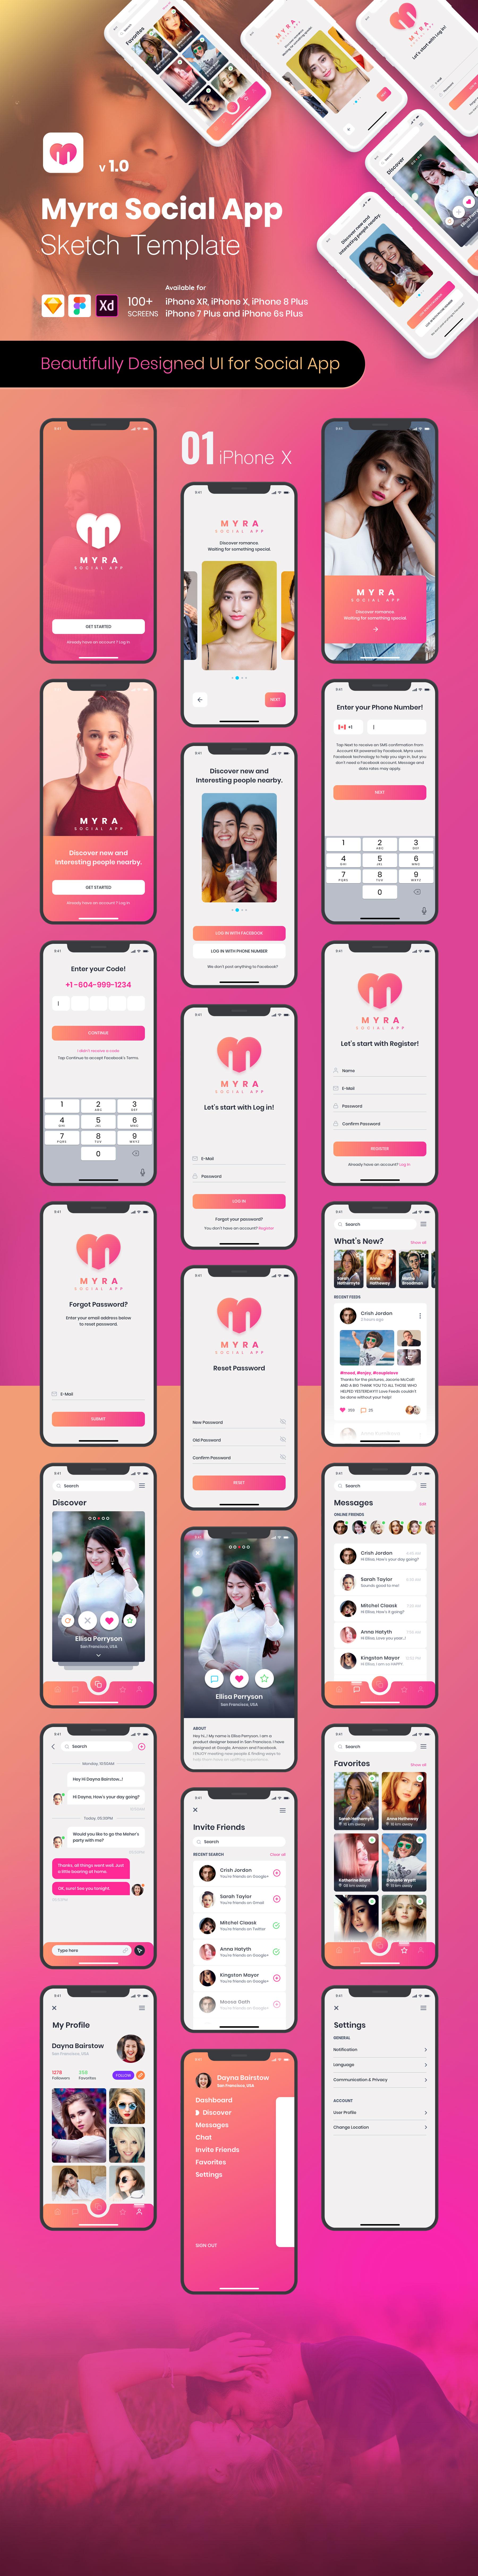 Myra Social App Sketch Template